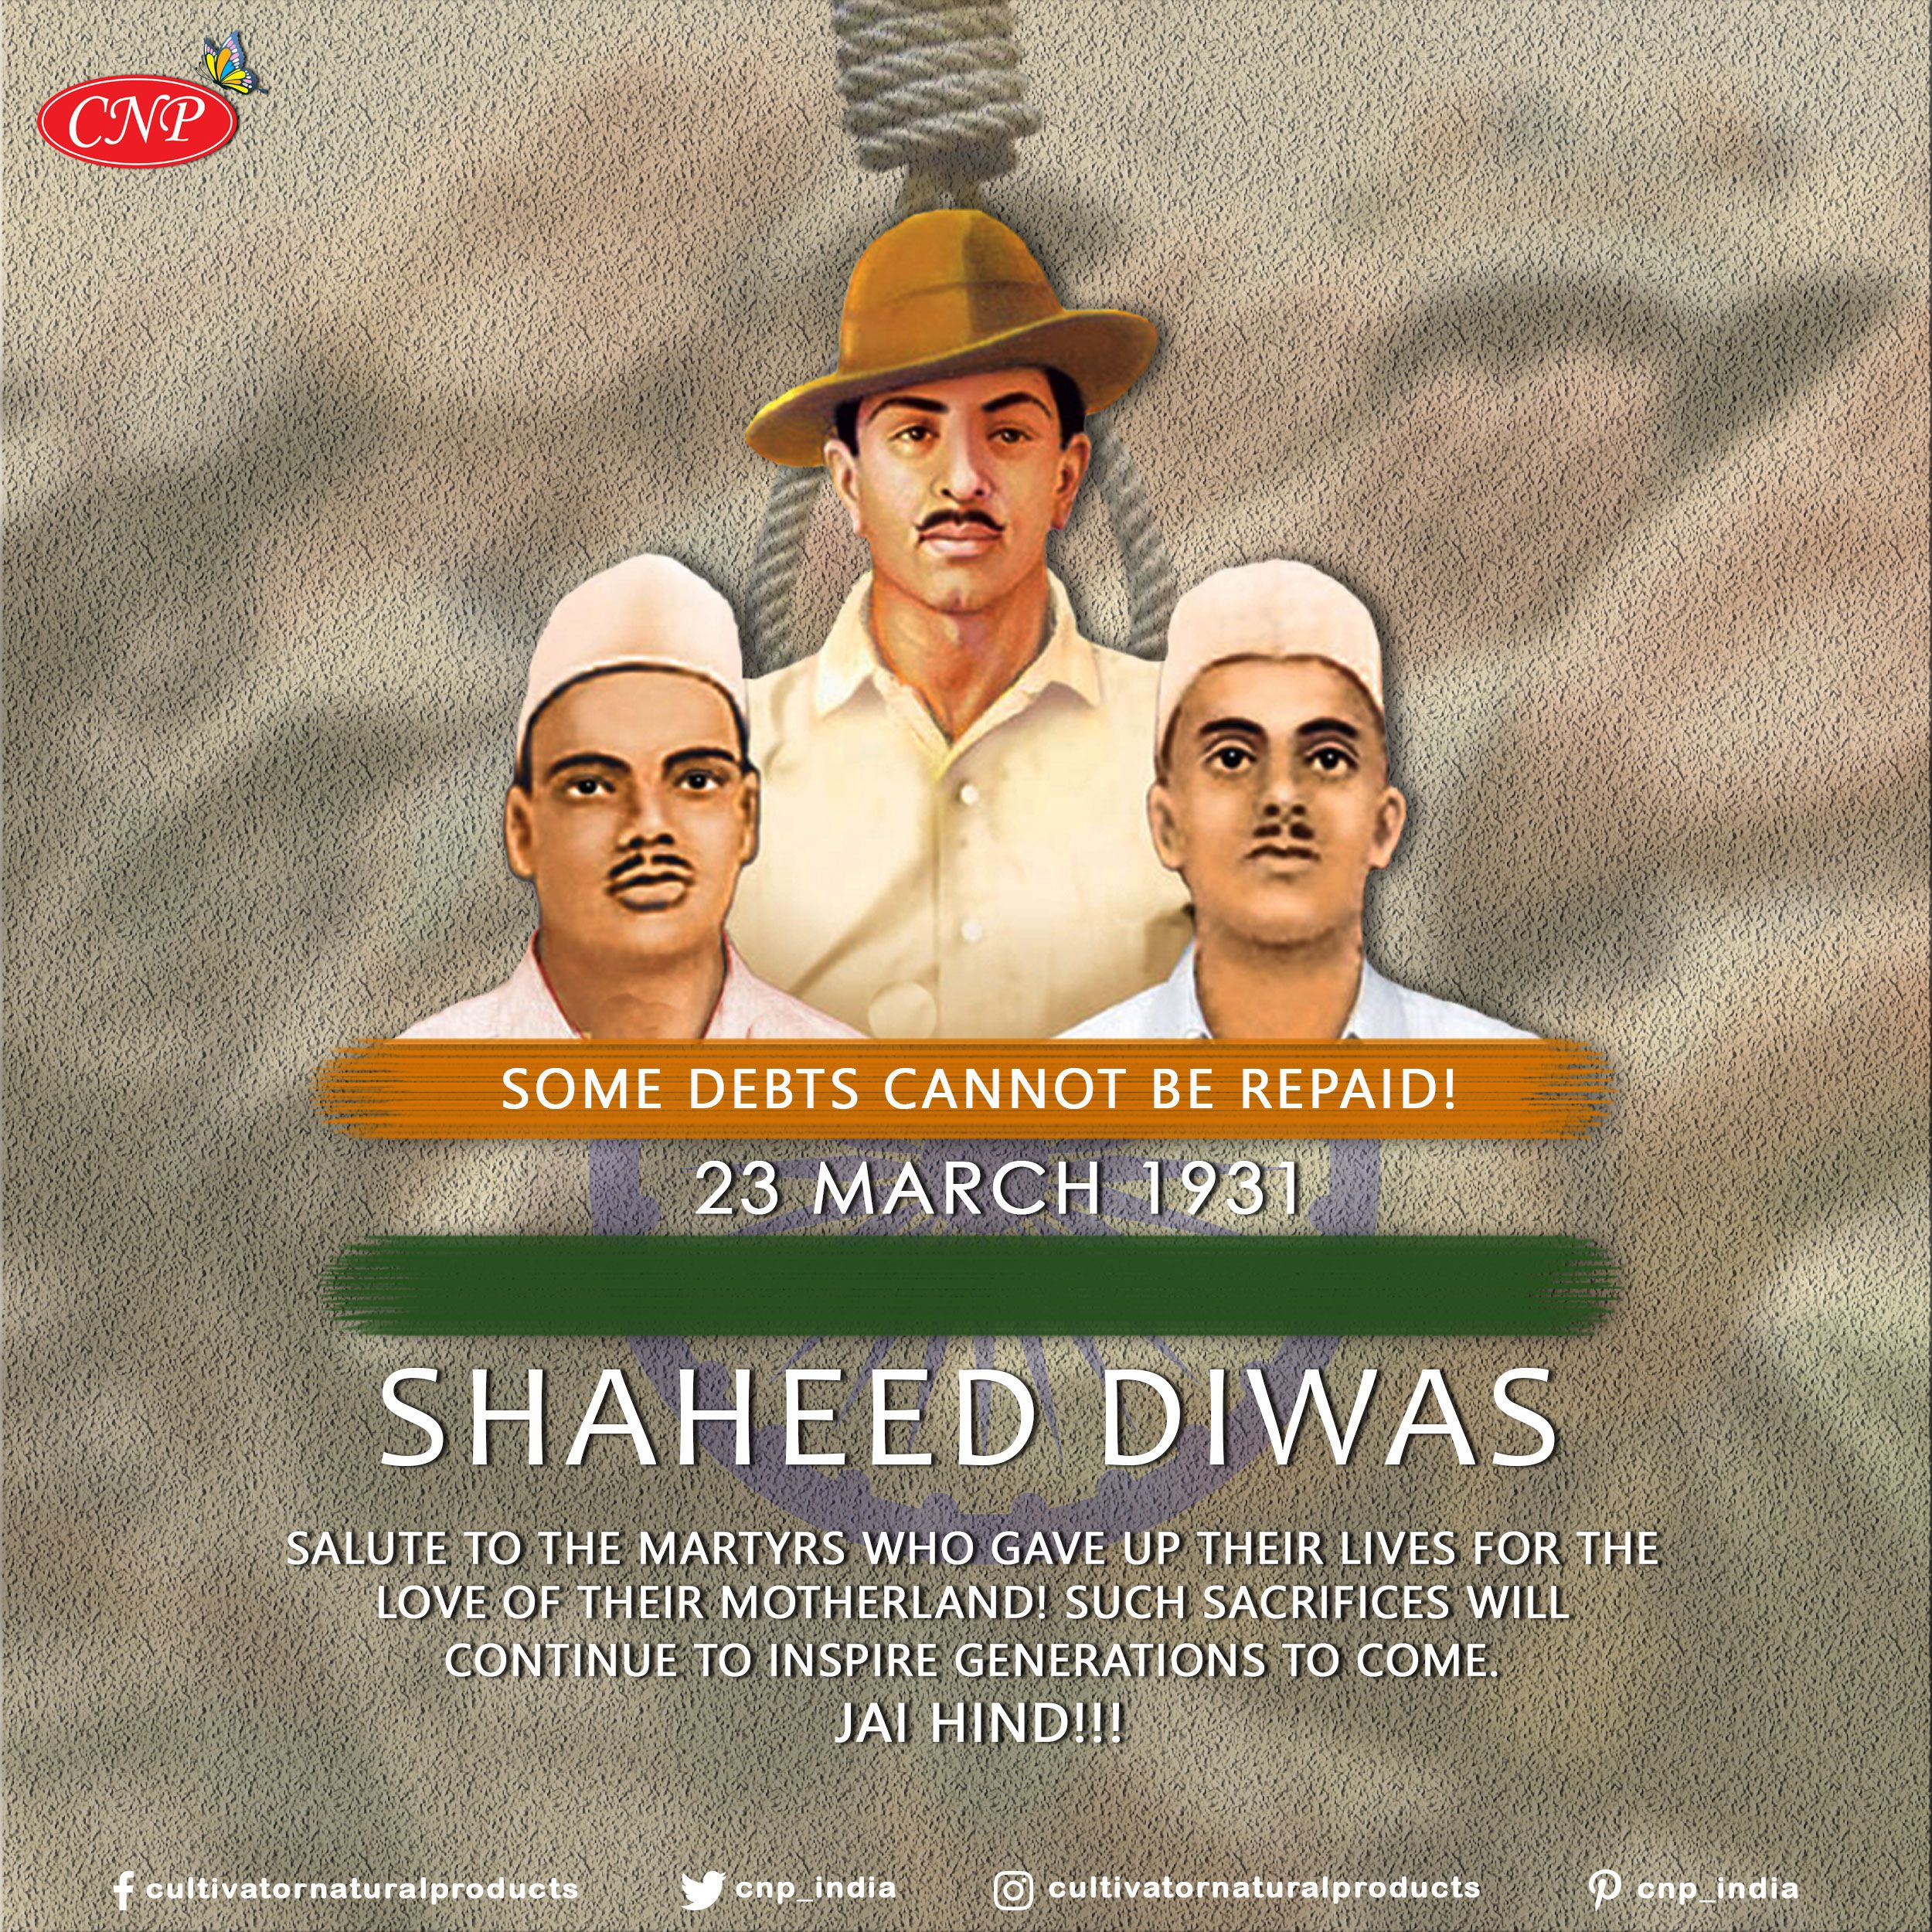 In order to bring freedom in India, Bhagat Singh, Rajguru